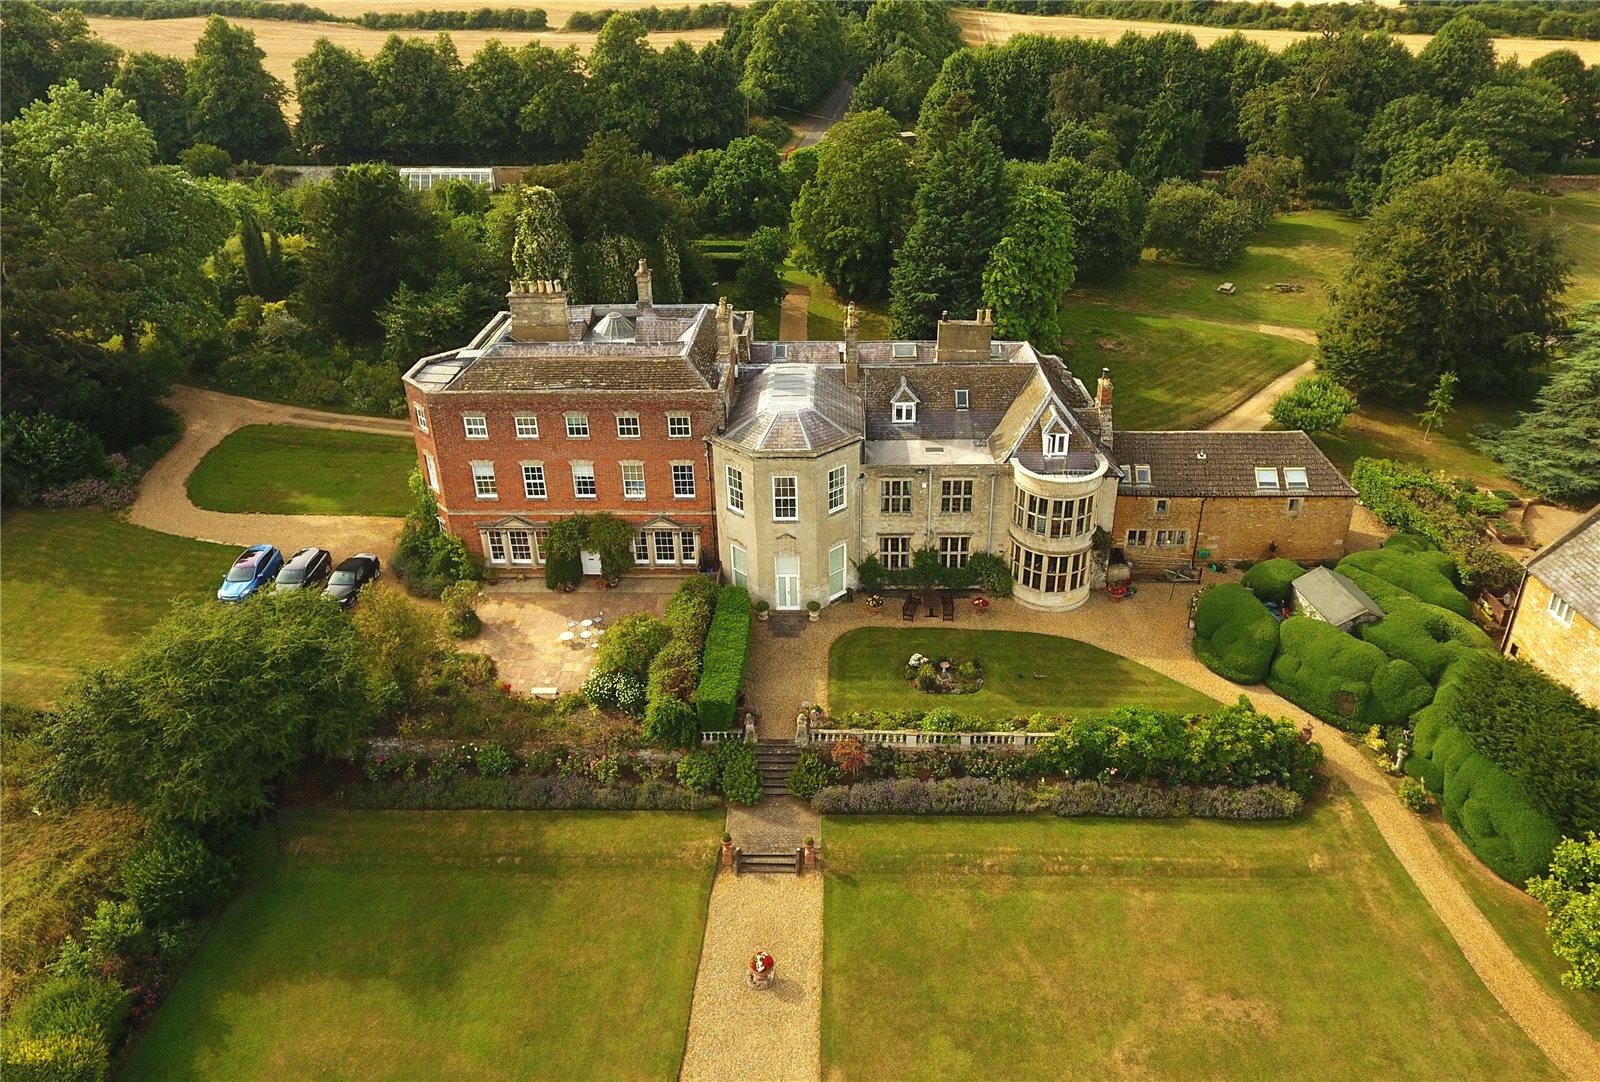 glendon hall, glendon, kettering, northamptonshire, nn14, a luxury